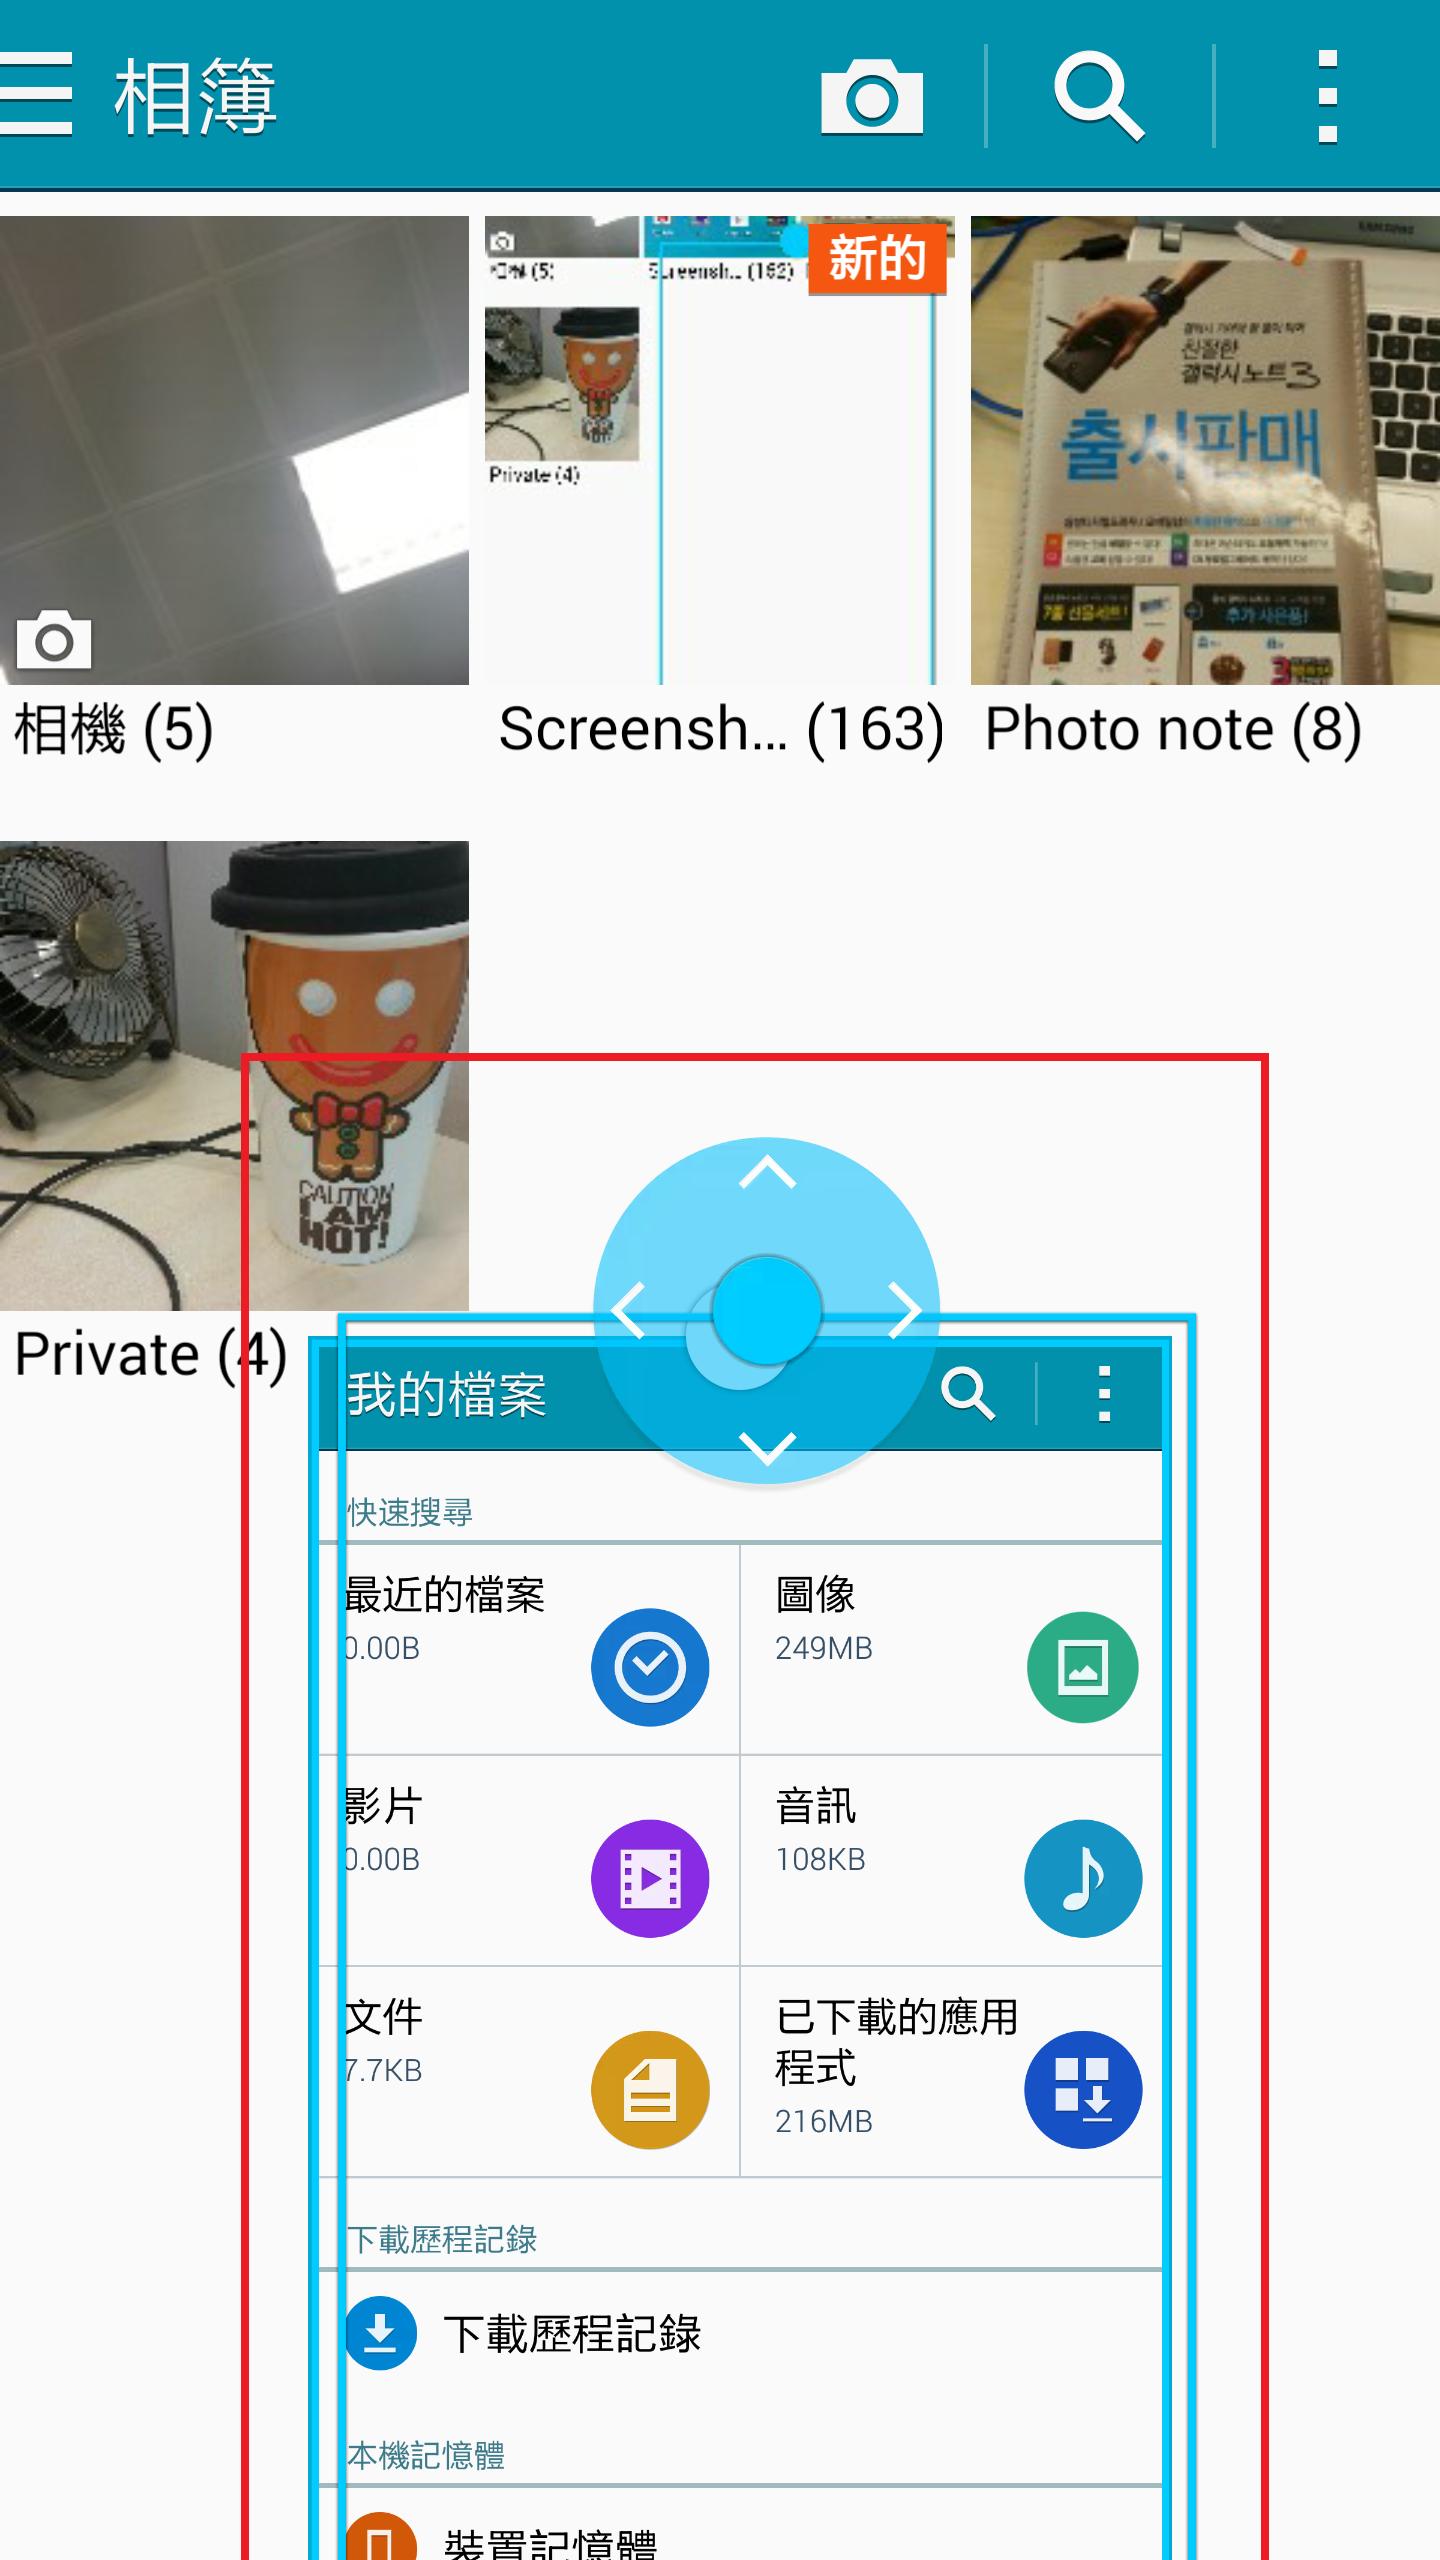 Galaxy Note4 如何使用多重視窗和彈出視窗檢視方式?